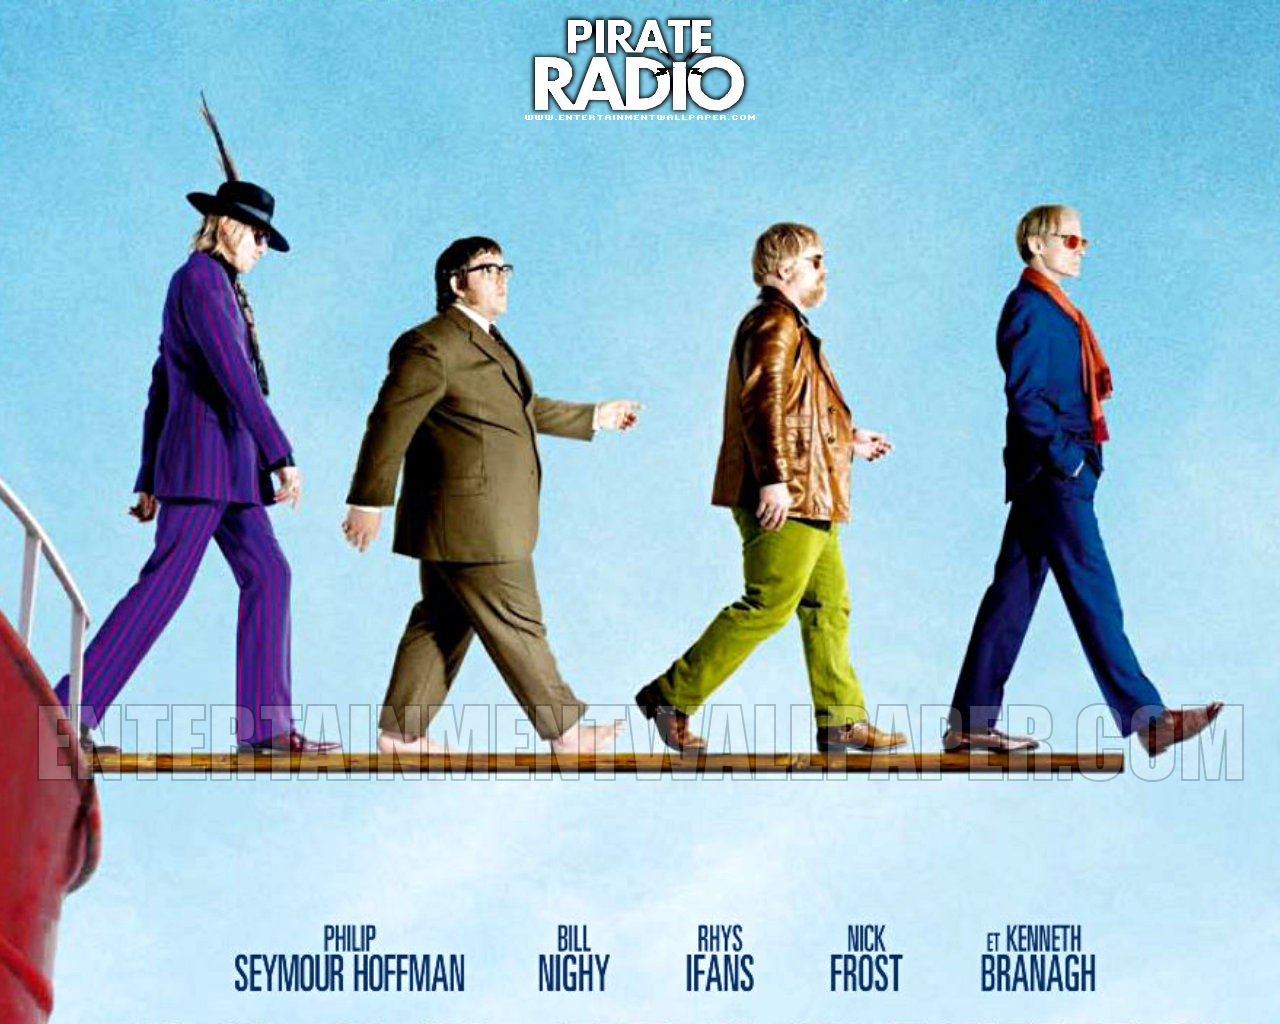 All Comedy Movies In 2009 soresport movies: pirate radio (2009) comedy